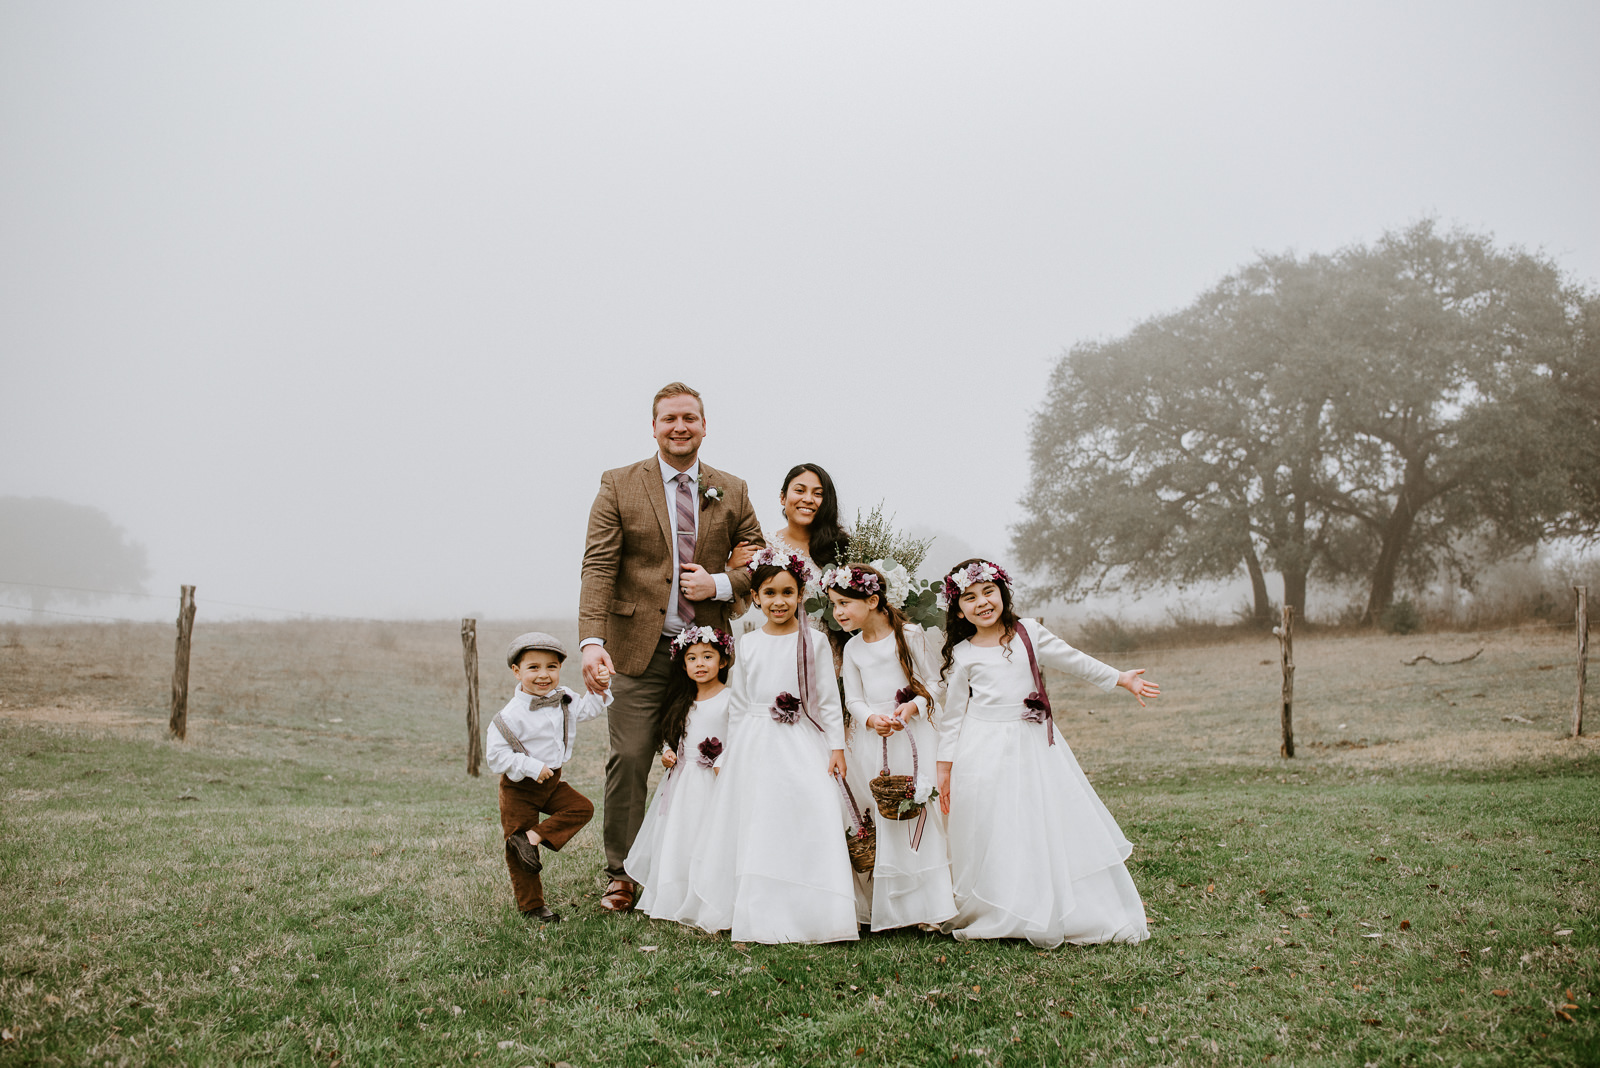 wedding formal portraits at stonehouse villa